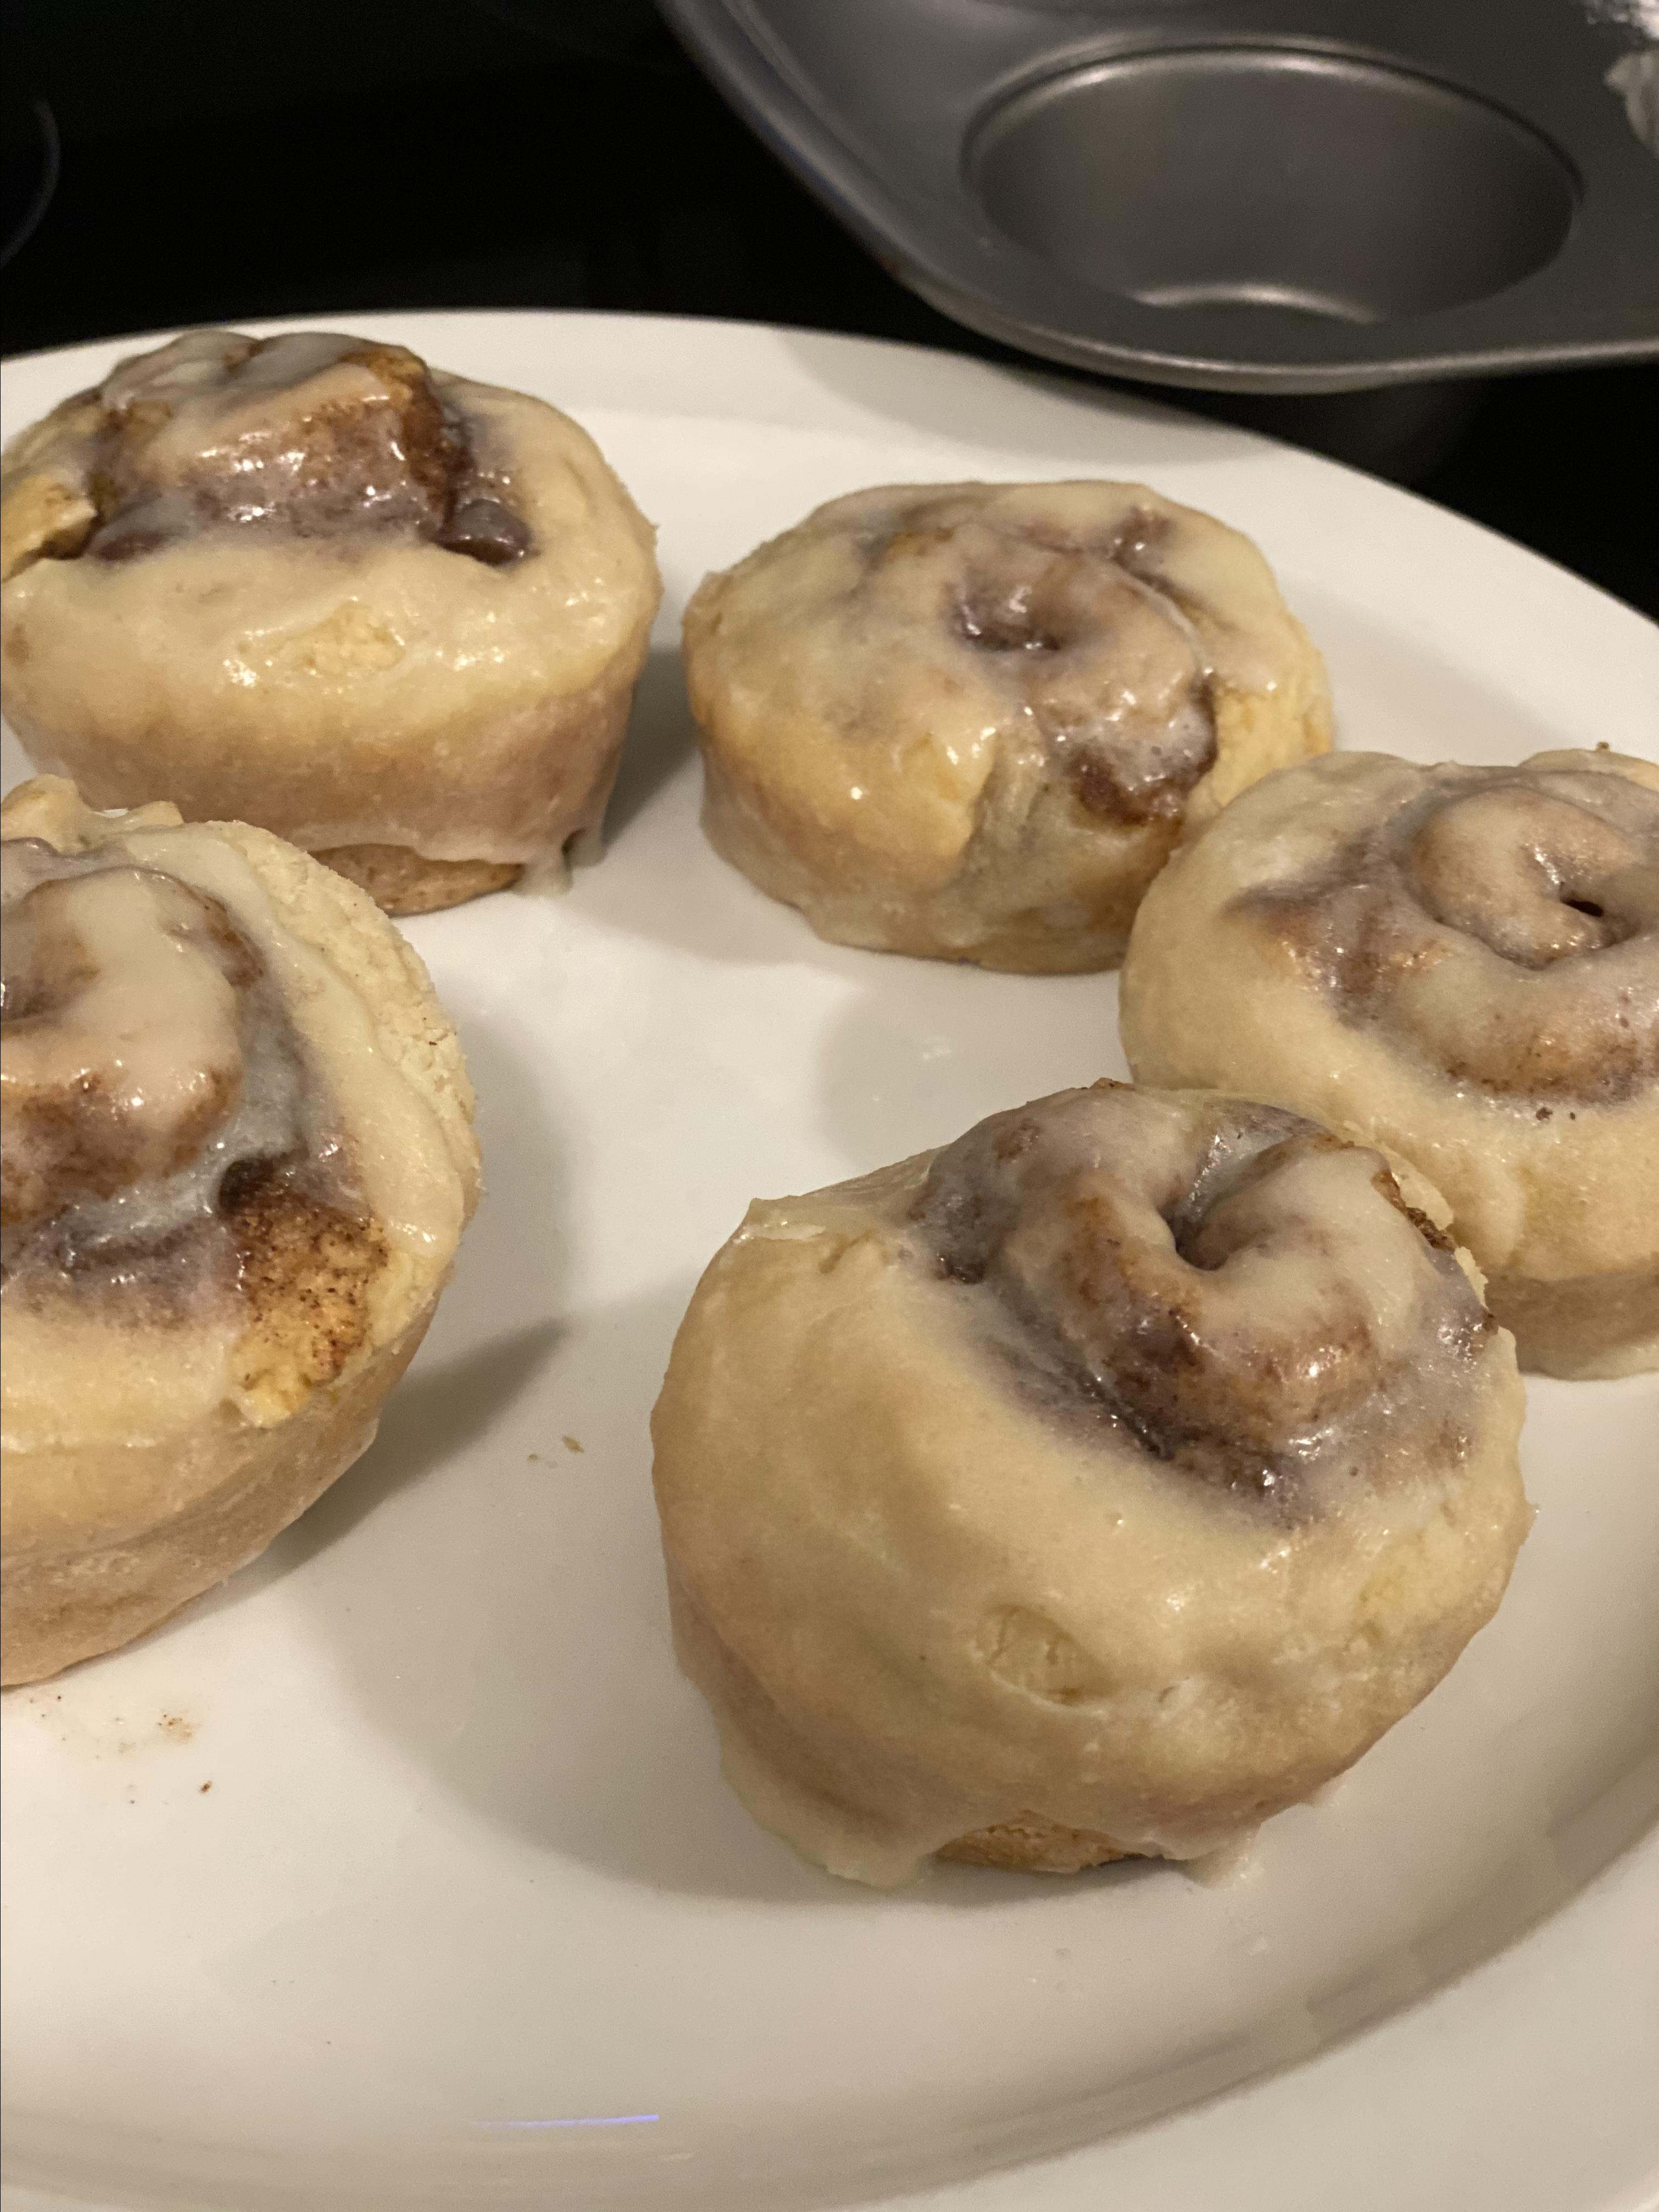 Small Batch Cinnamon Rolls (No Yeast)